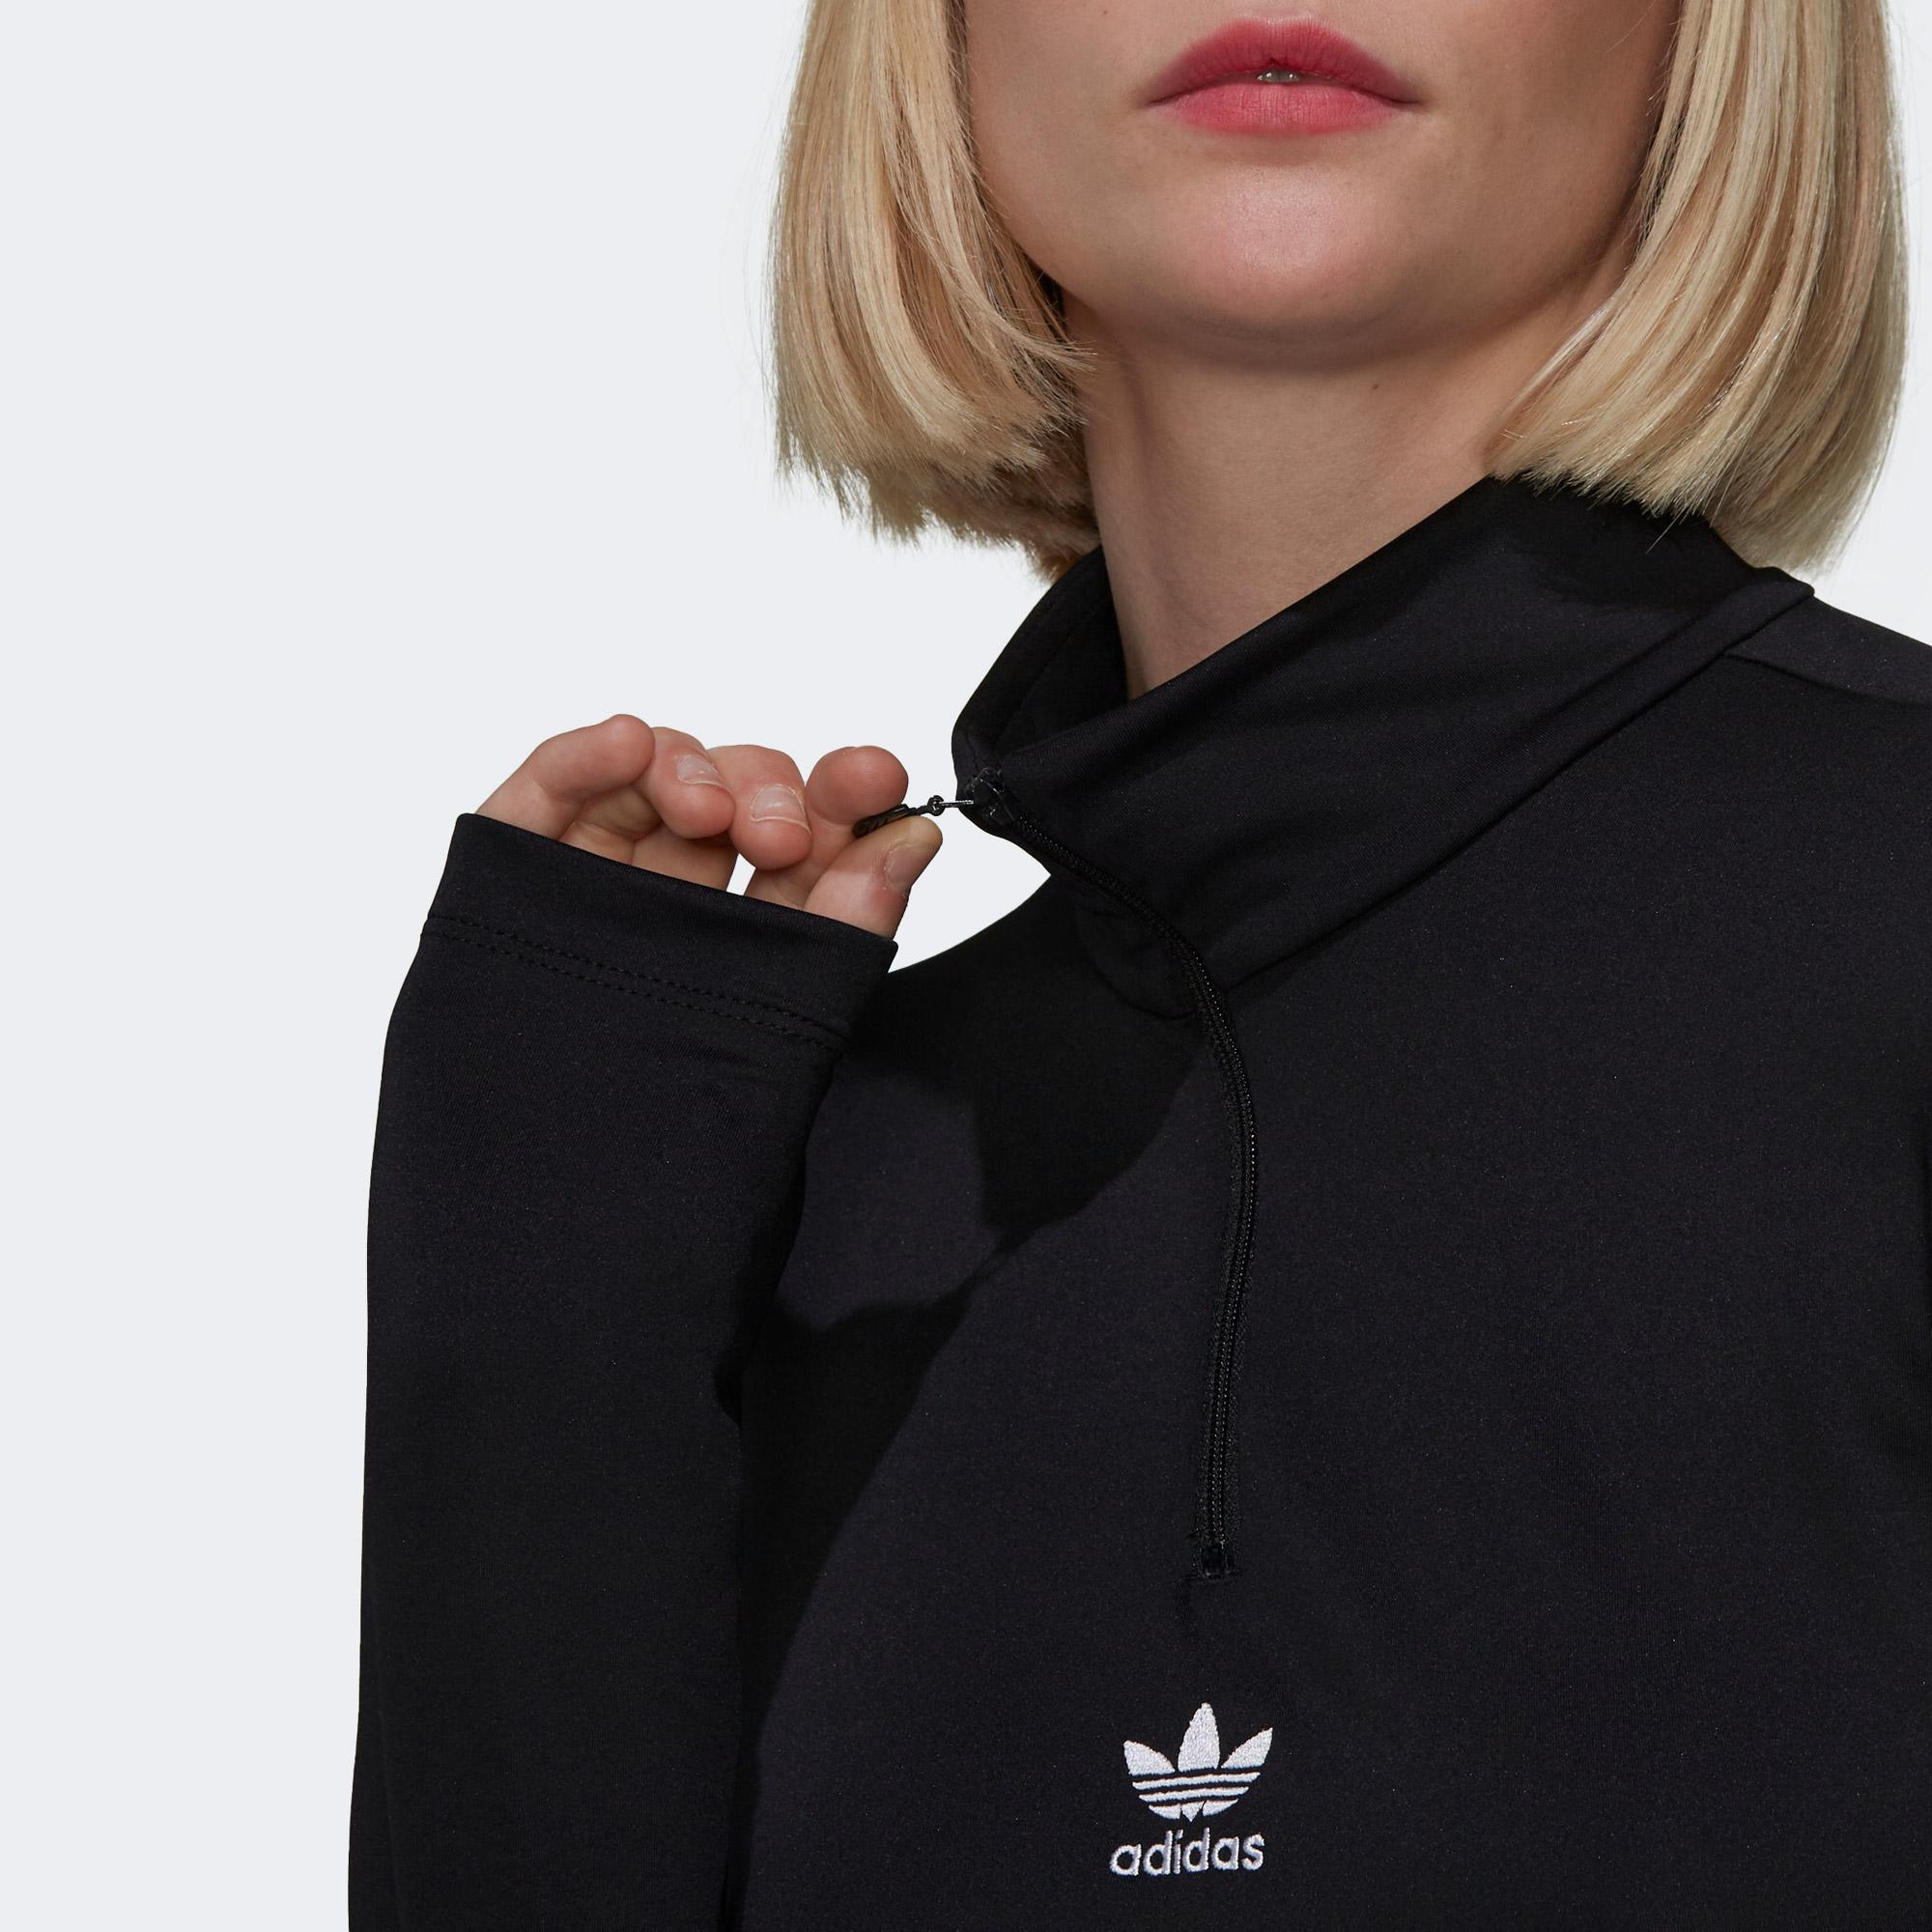 adidas Kadın Siyah Elbise